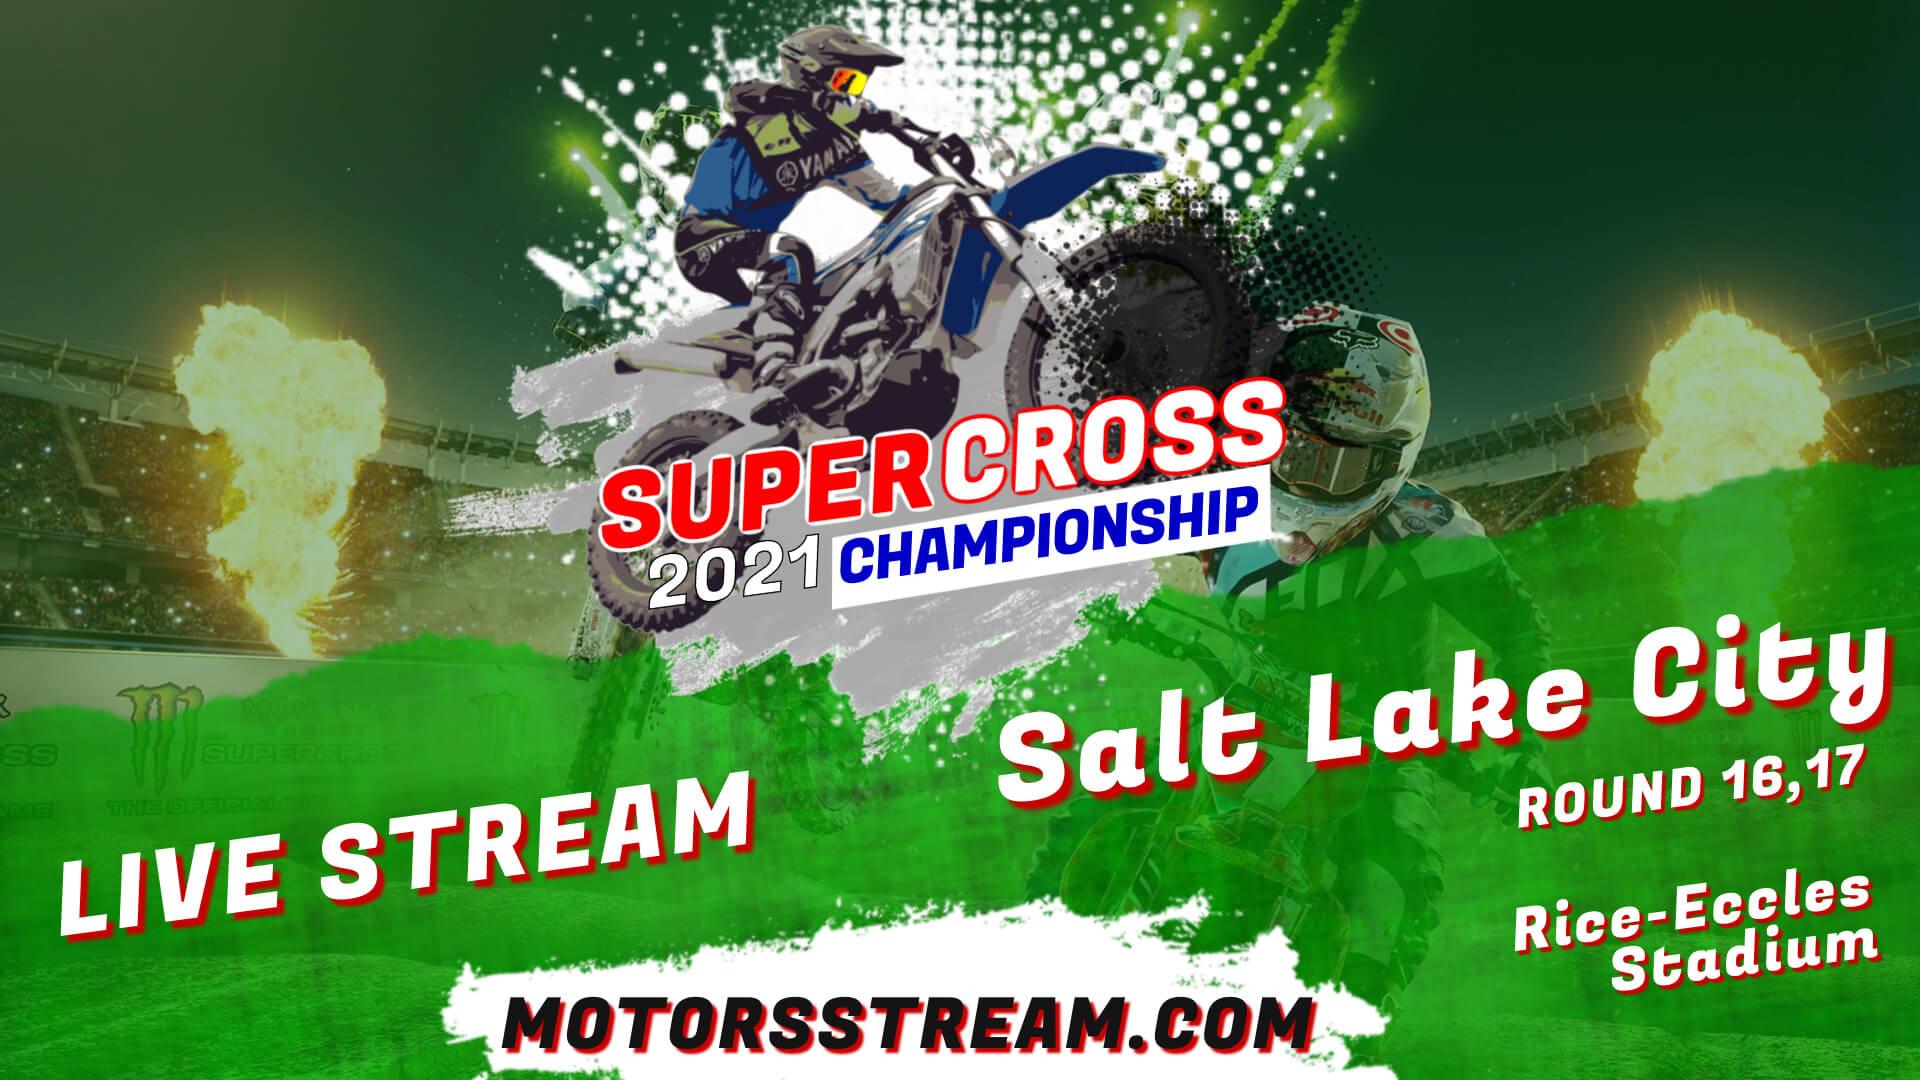 Supercross Salt Lake City Live Stream